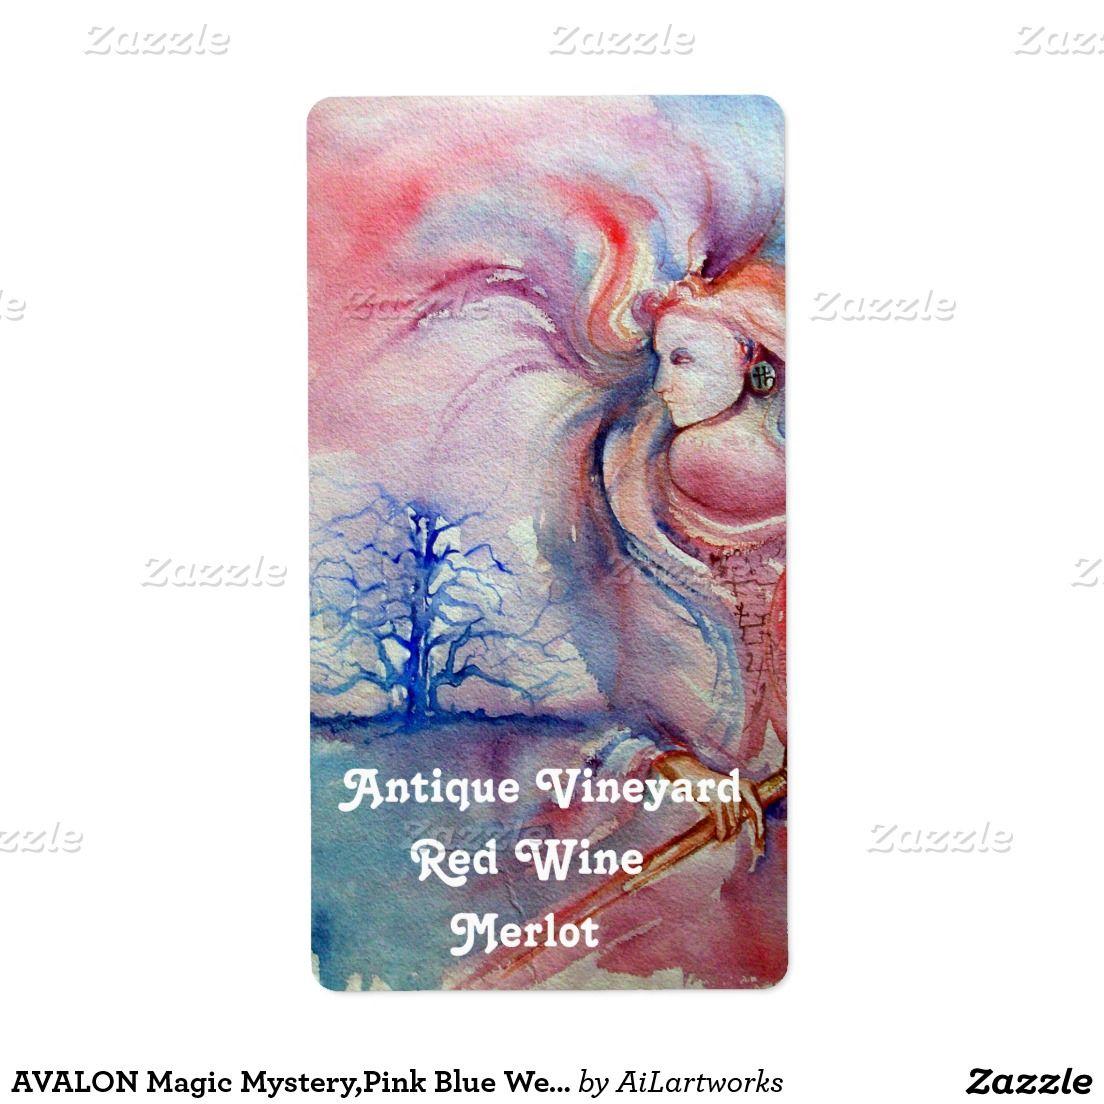 AVALON Magic Mystery,Pink Blue Wedding Wine Bottle Shipping Label